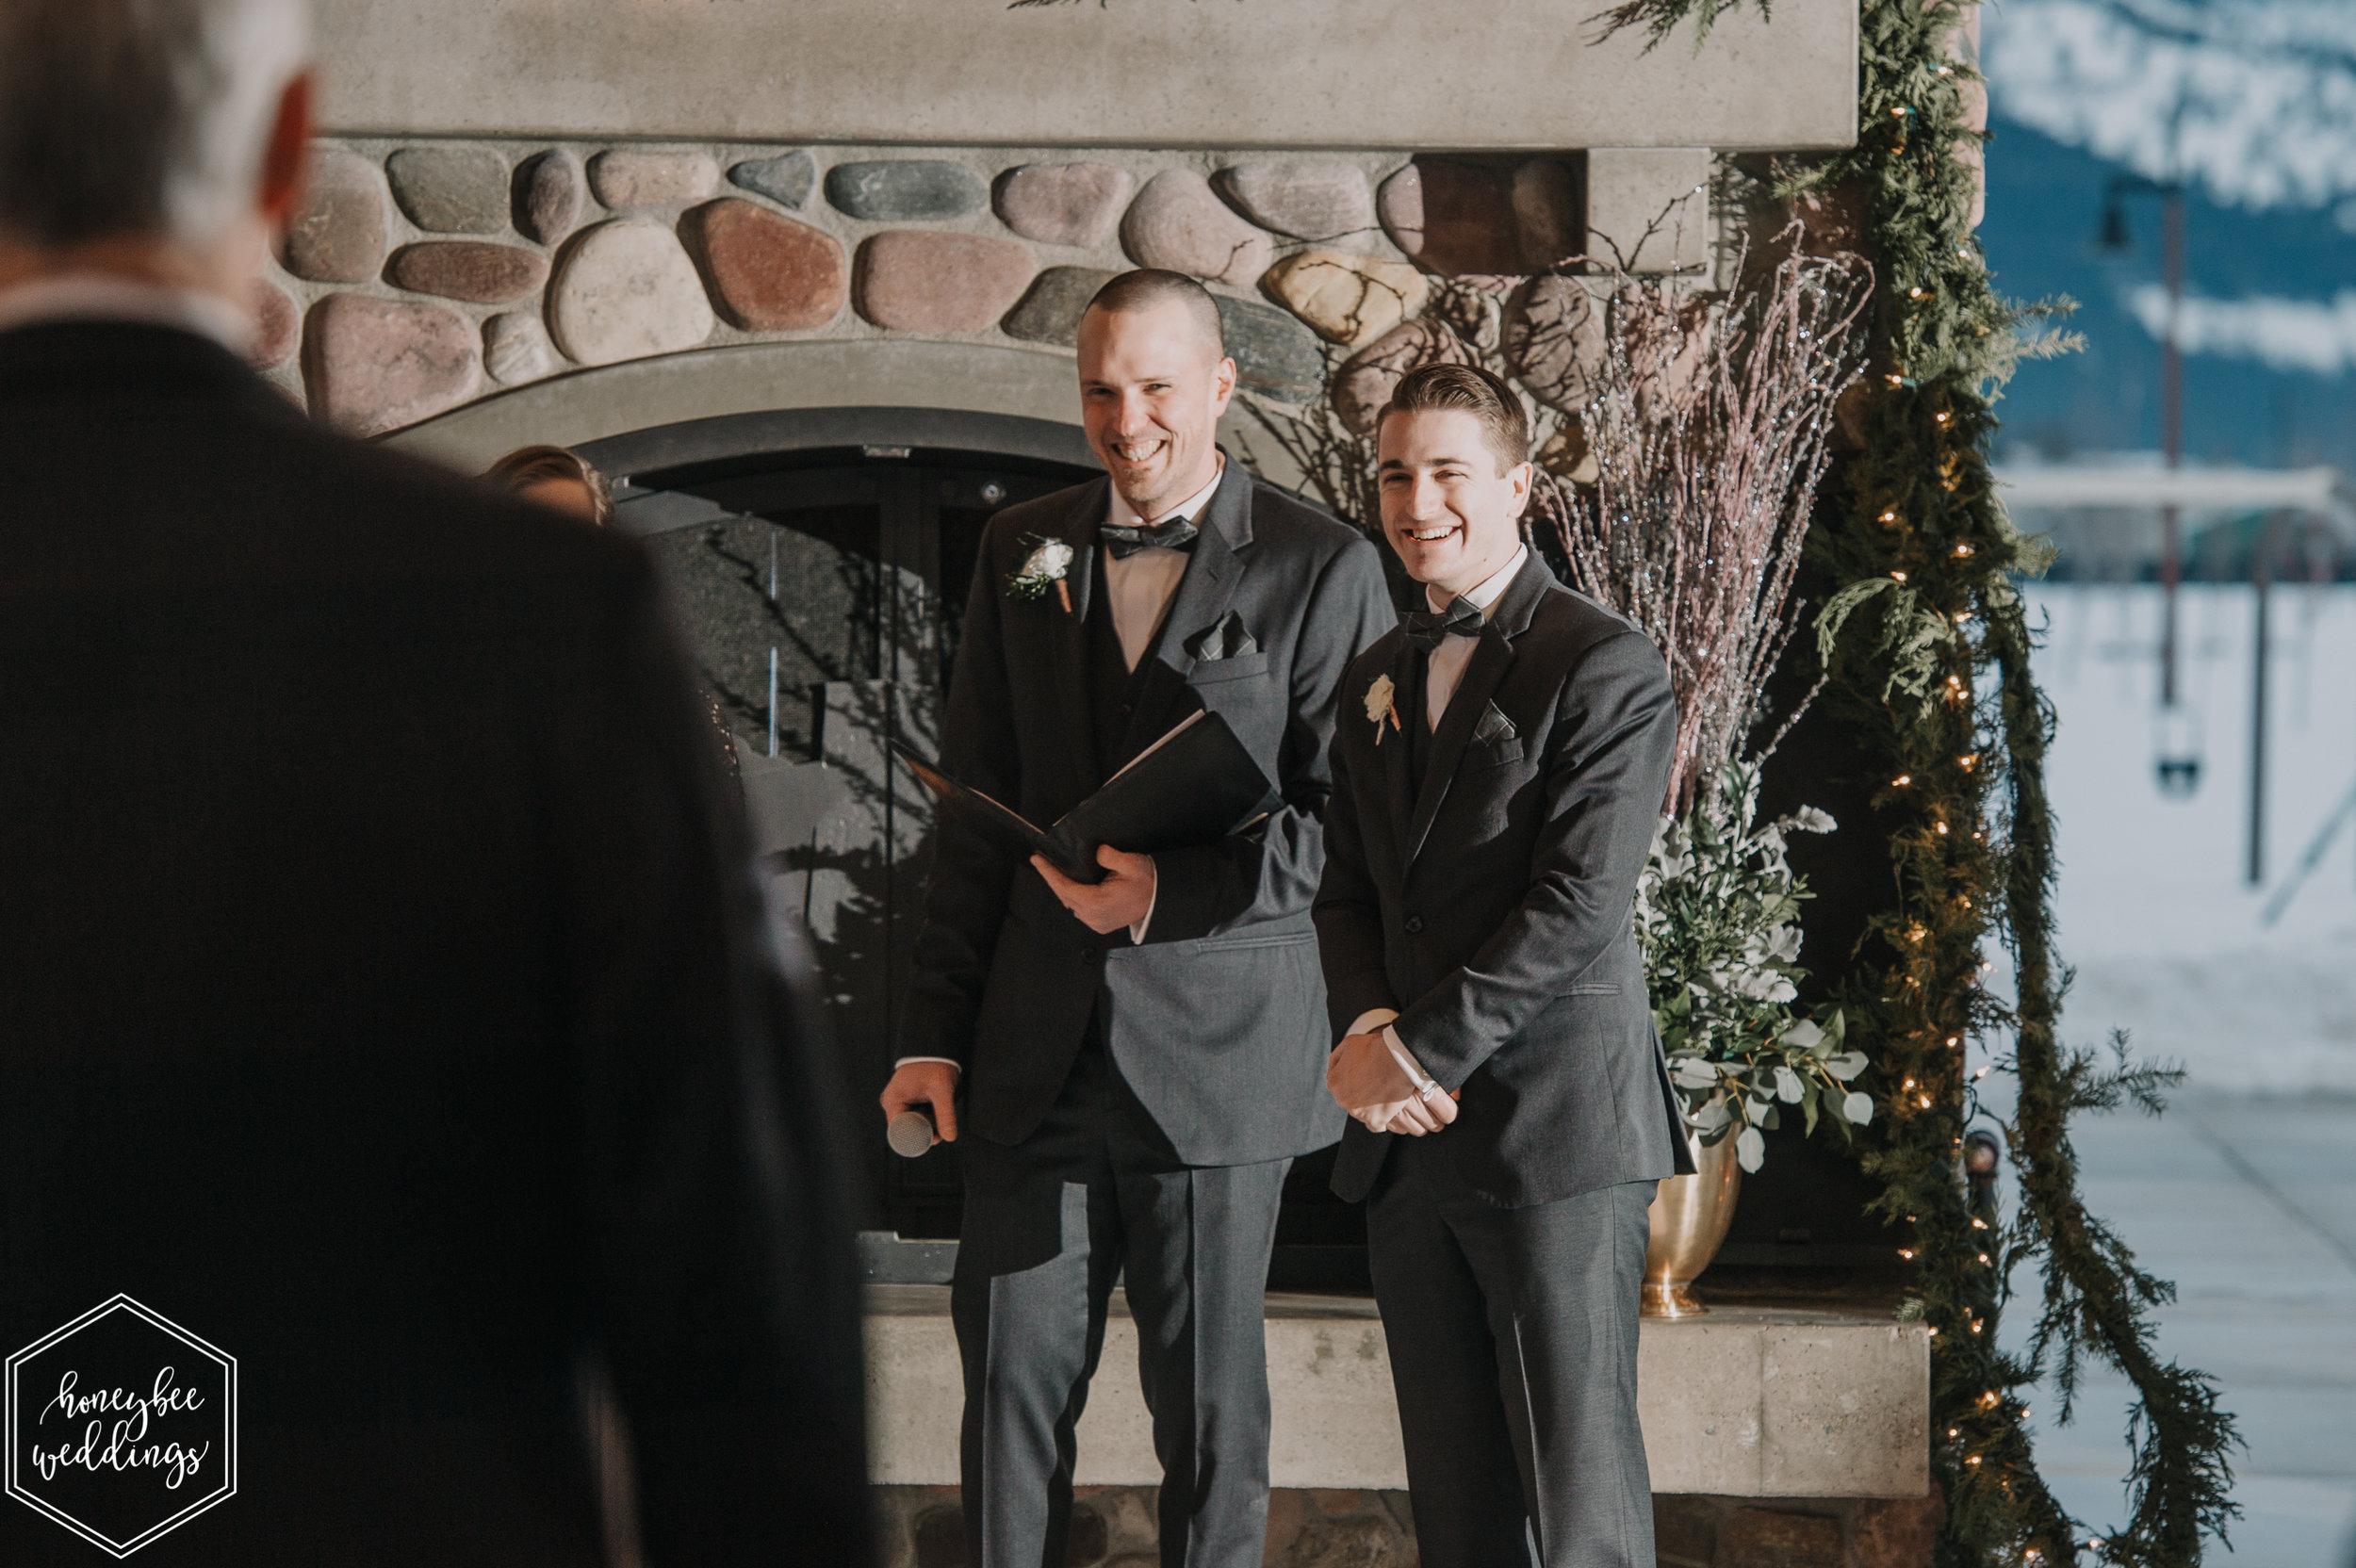 0233Montana Wedding Photographer_Montana winter wedding_Wedding at Fort Missoula_Meri & Carter_January 19, 2019-463.jpg